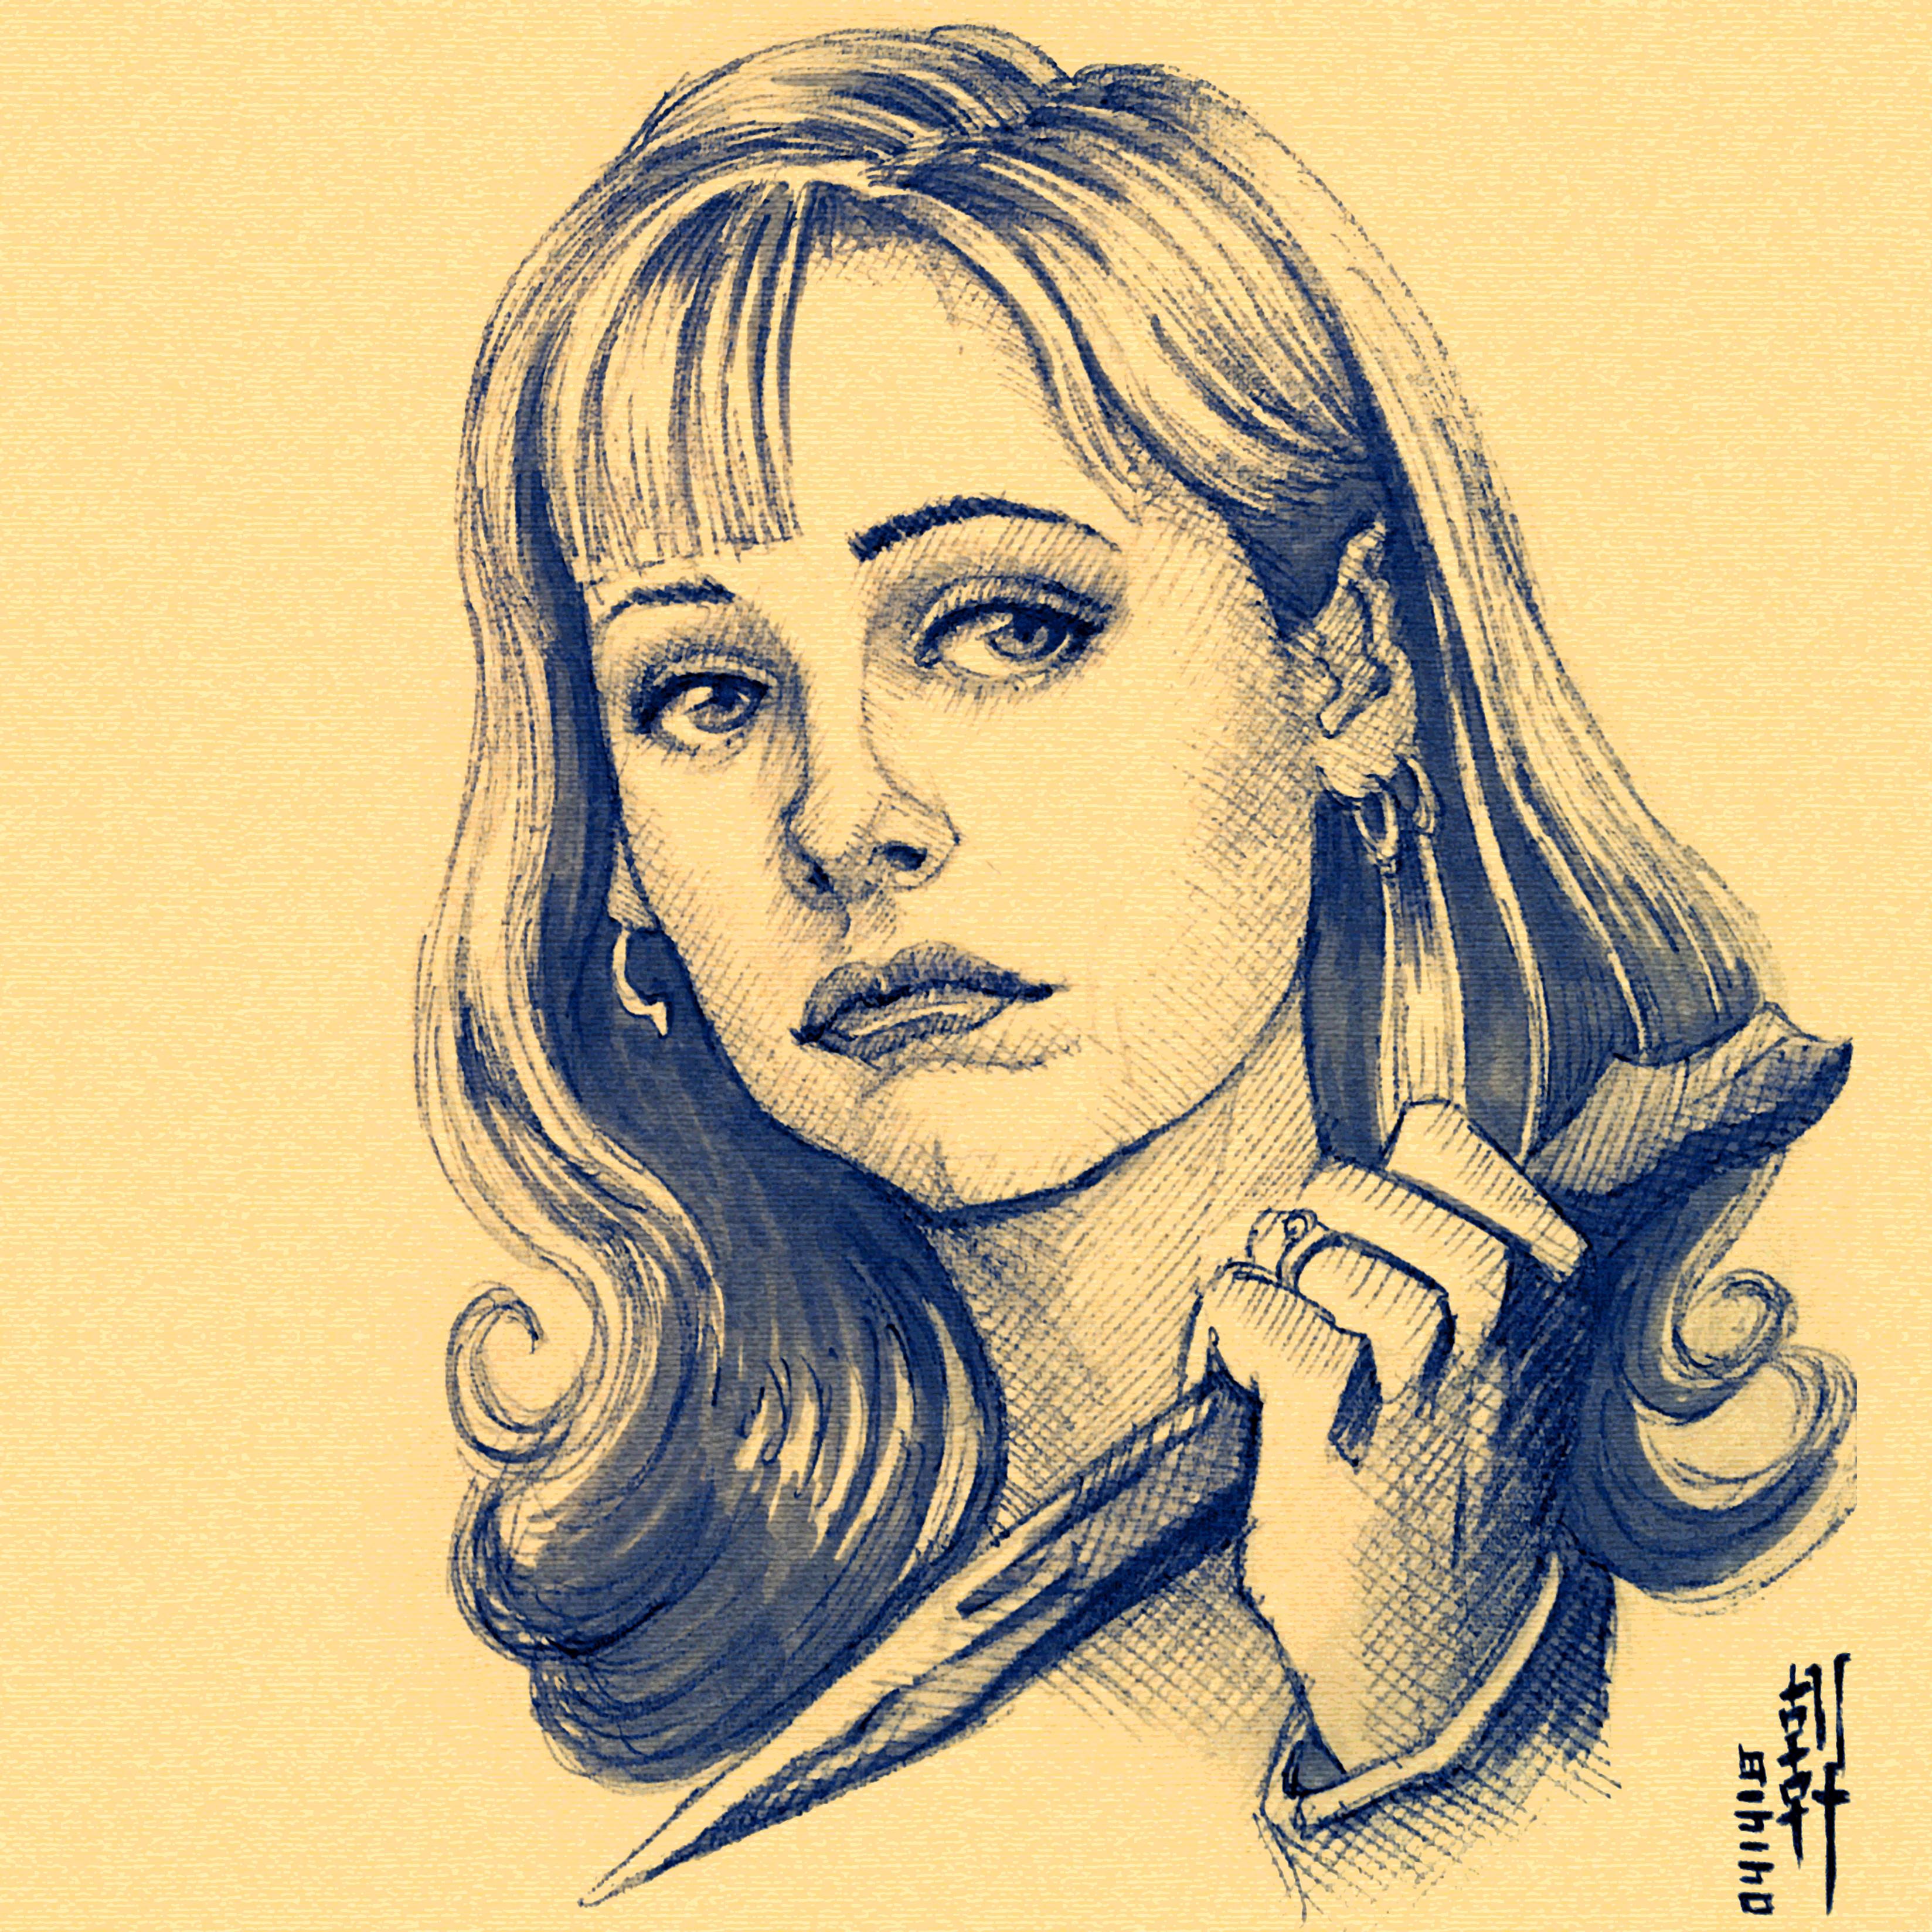 Day 04-14-18 - Buffy